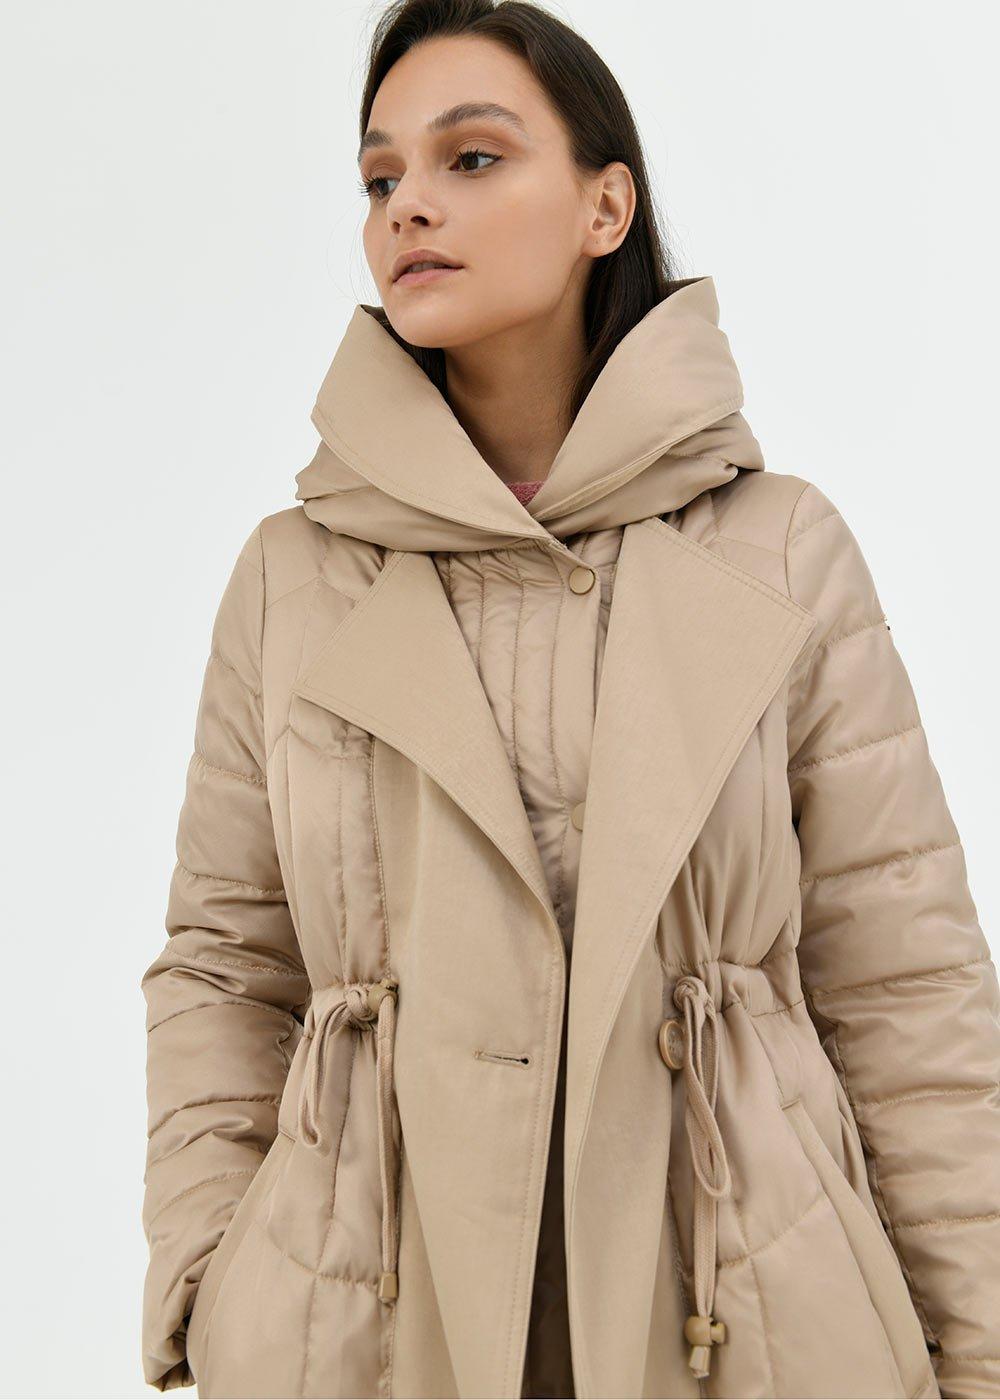 Paige trench coat-model bi-material down jacket - Light Beige - Woman